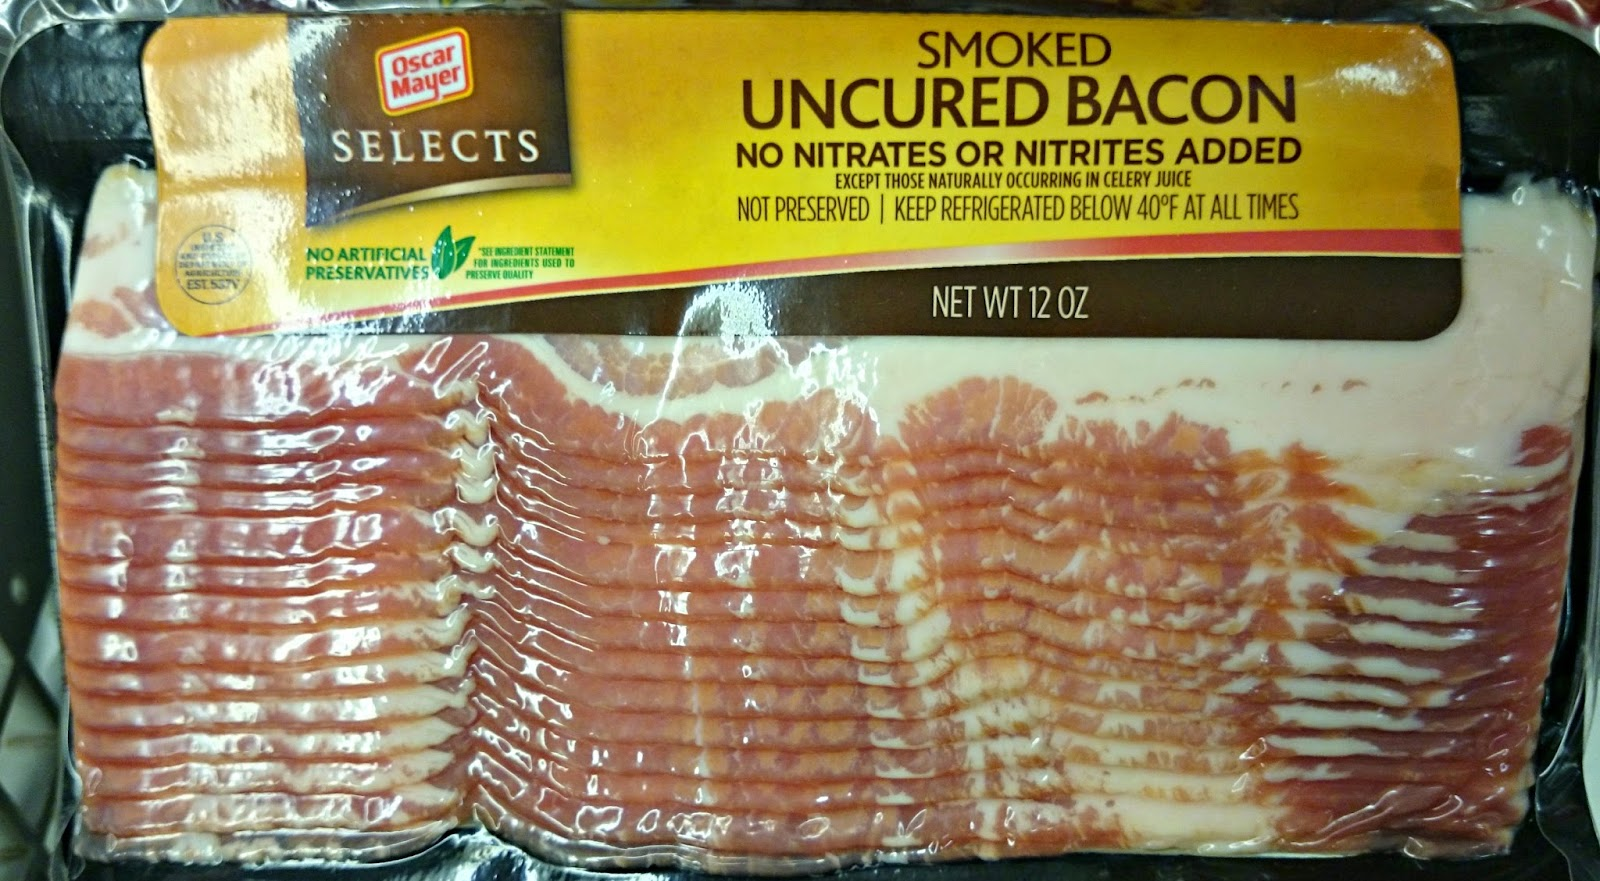 P3 Nutrition Label Oscar Mayer also Houston Tx as well Schertz further Edible Idol Blt further Low Calorie Bacon Recipes. on oscar mayer naturals bacon